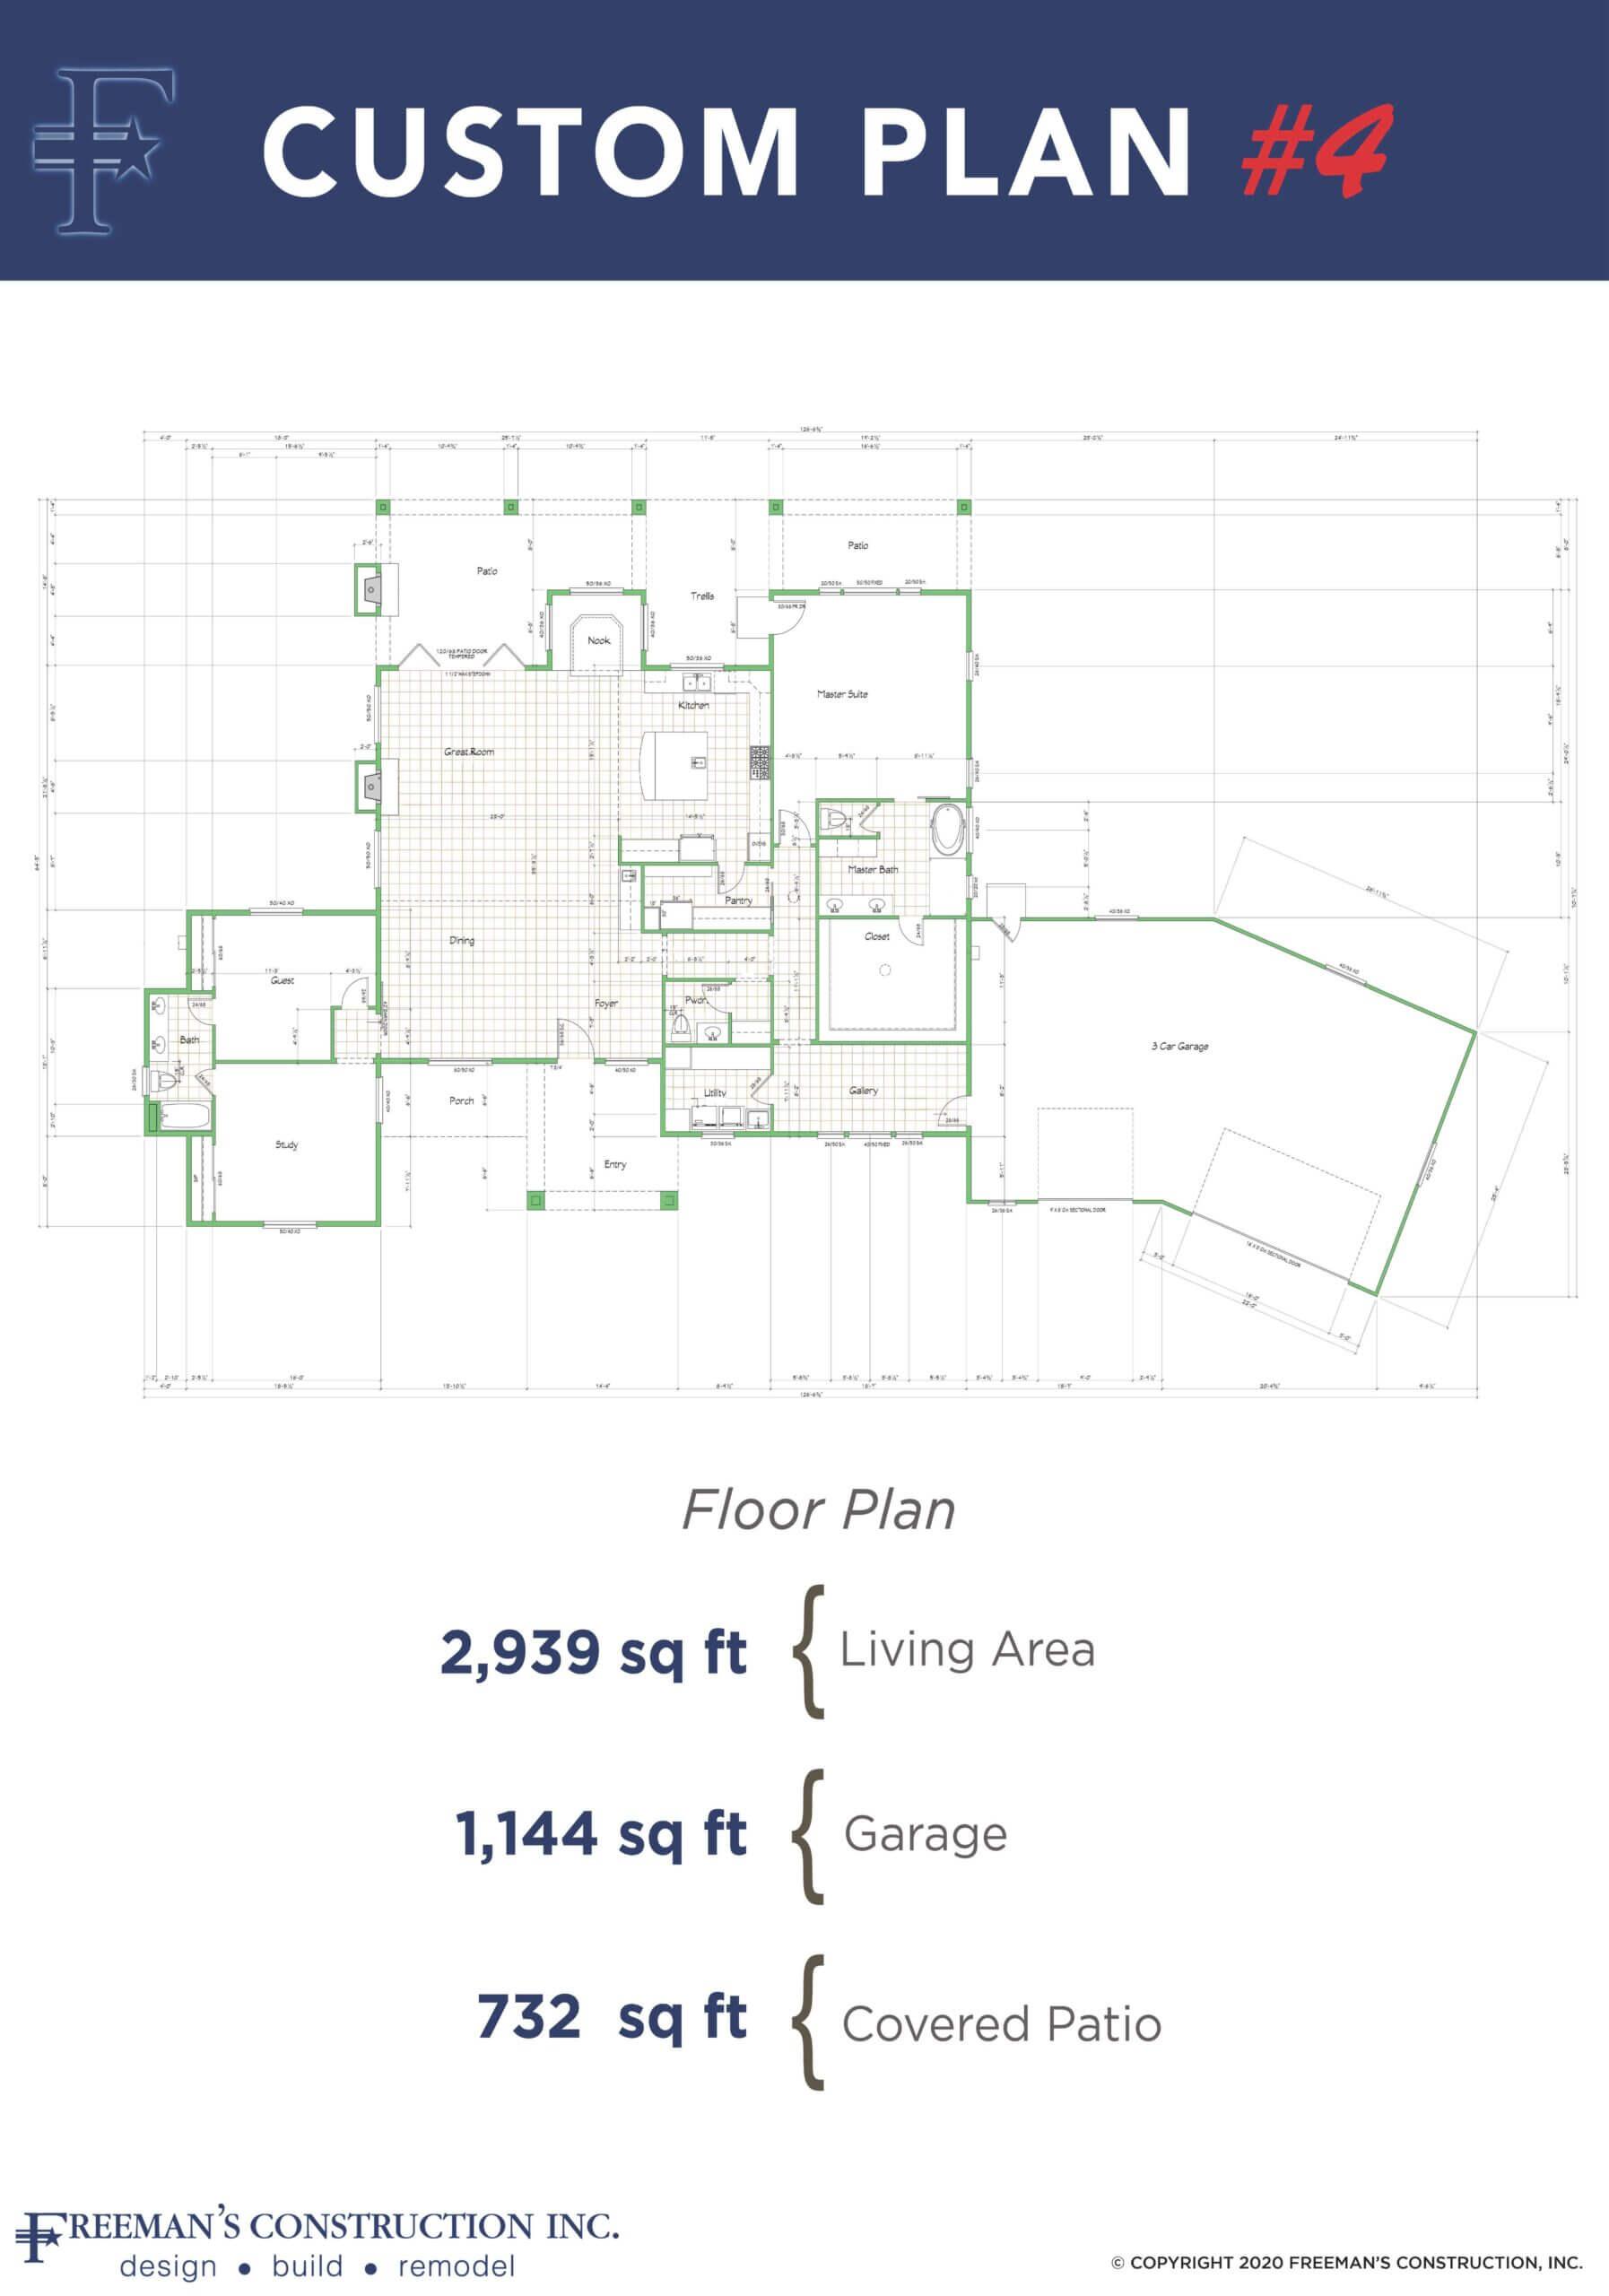 custom-home-floor-plan-4-in-san-diego-county-ca-by-freemans-construction-inc